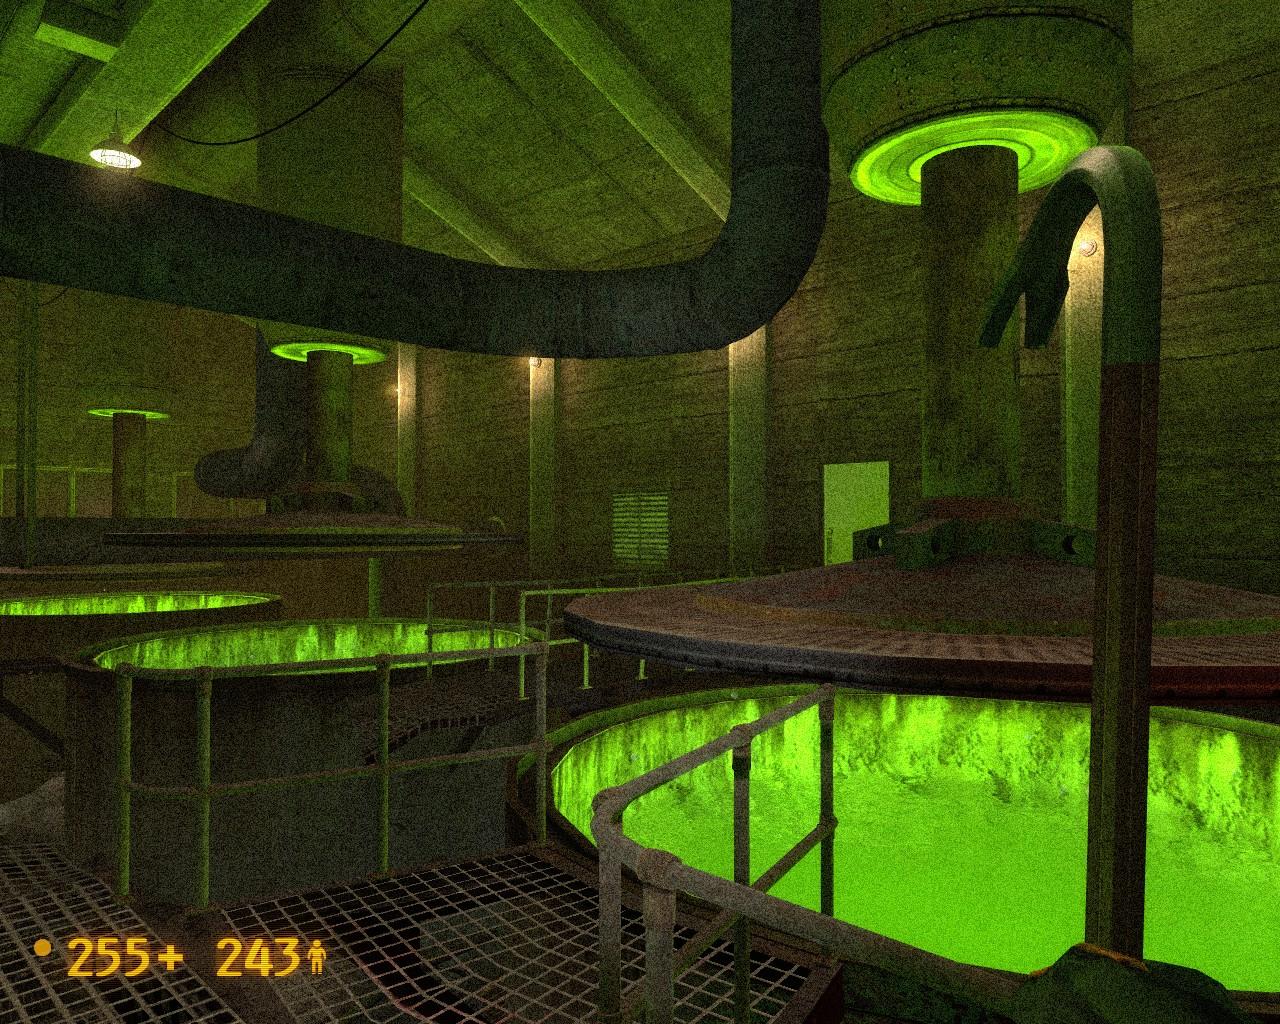 bm_c2a4a0016.jpg - Half-Life